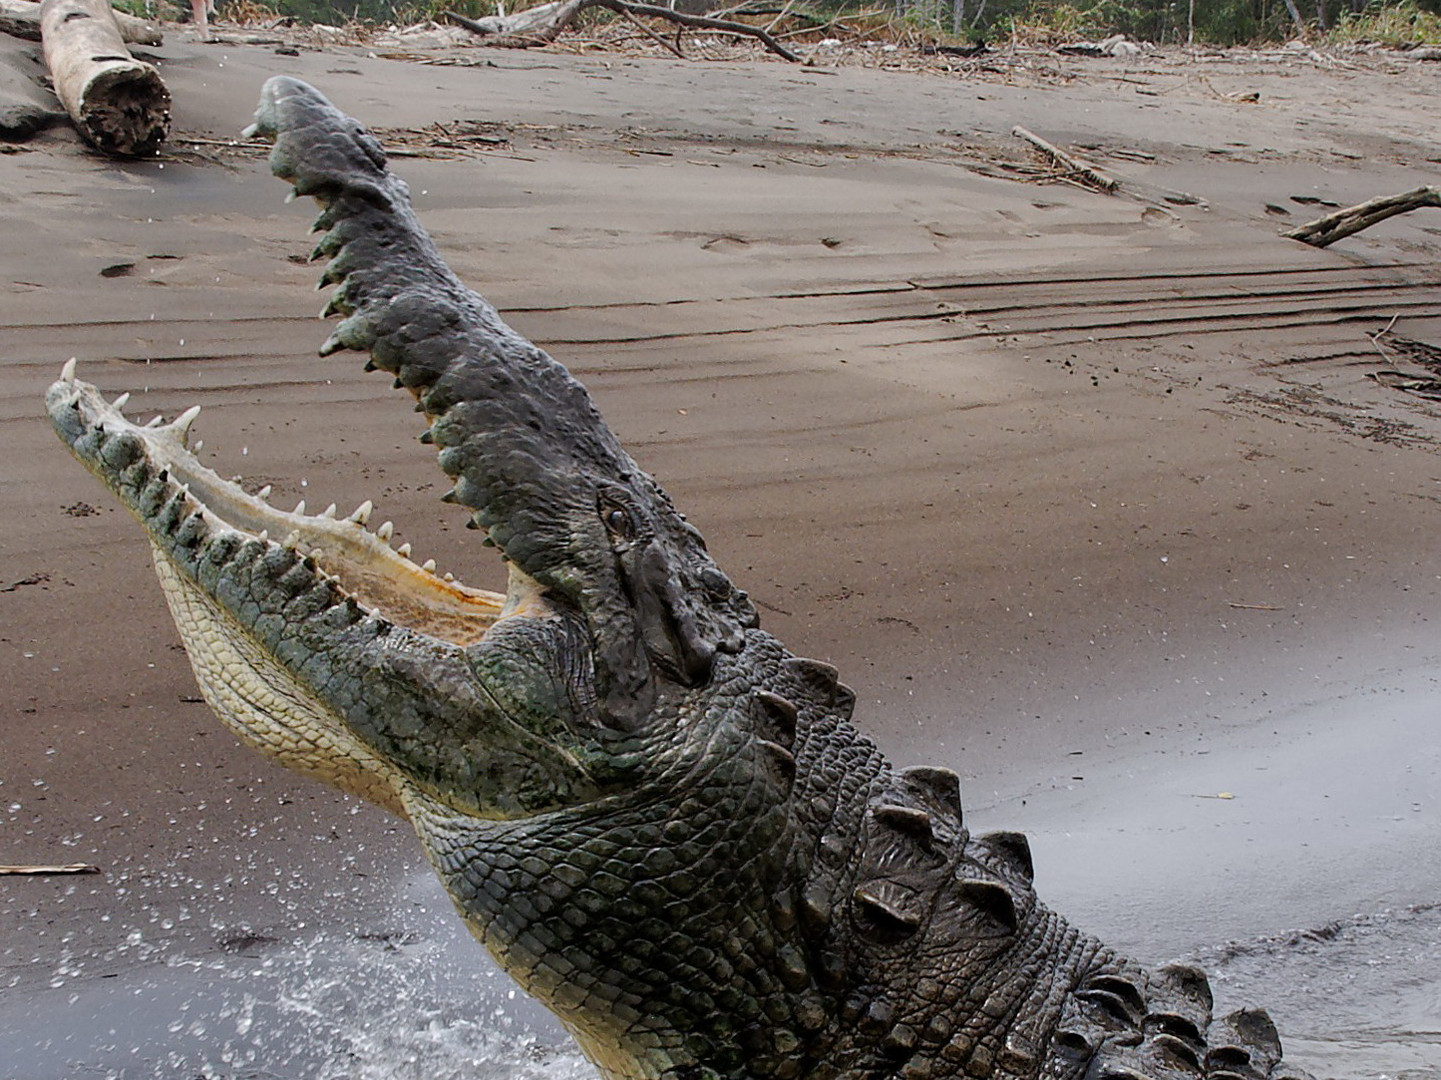 Costa Rica am Fluß Tarcoles